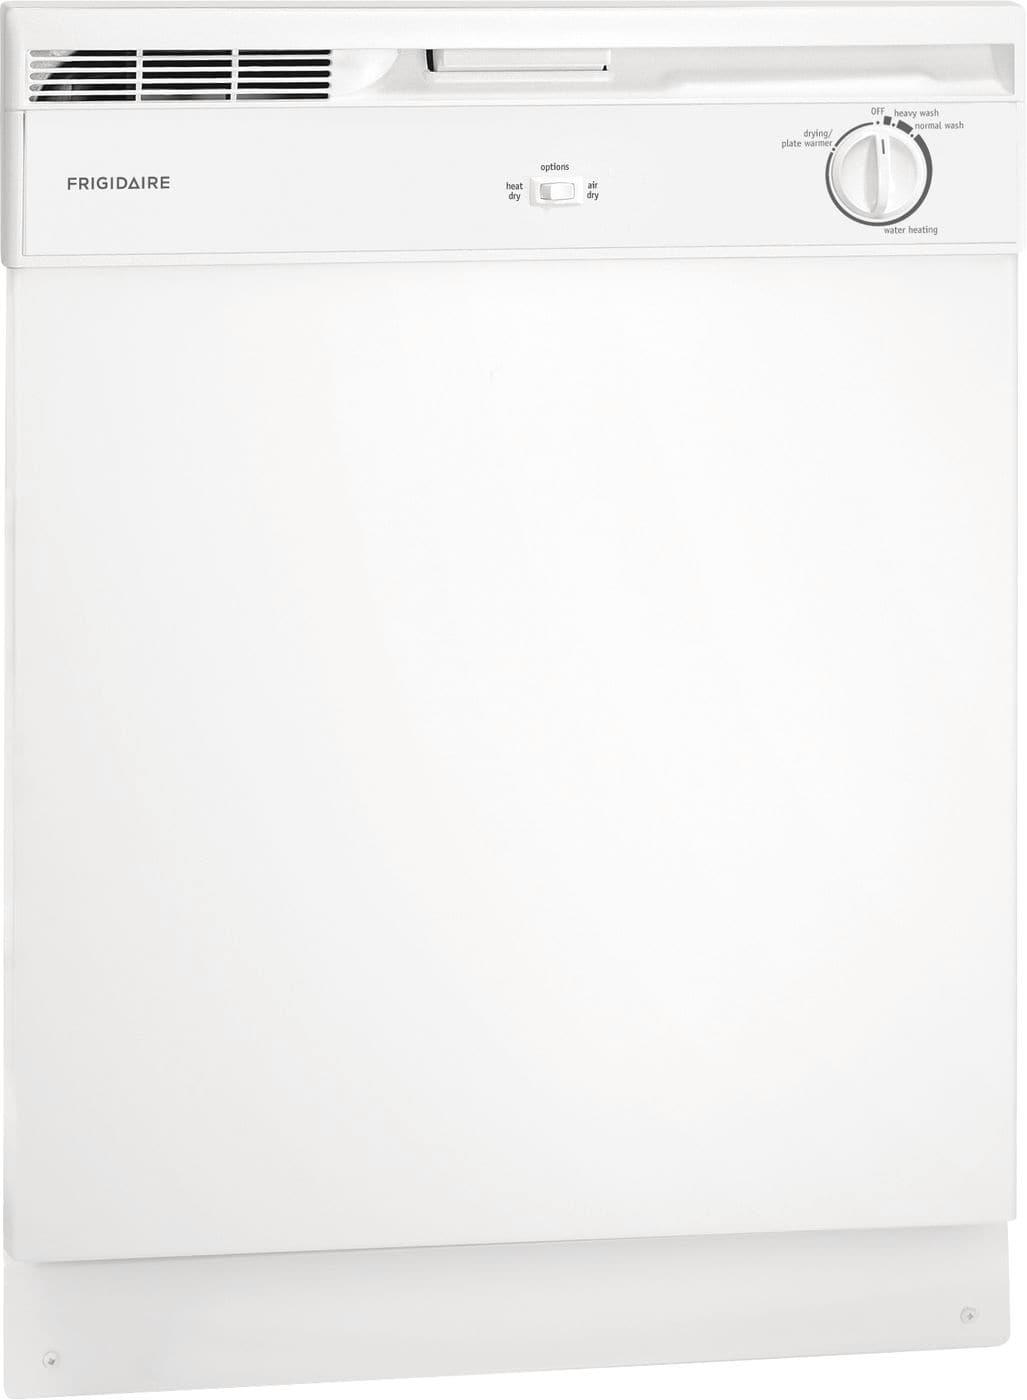 Model: FFTW4120SW | 4.1 Cu. Ft. High Efficiency Top Load Washer